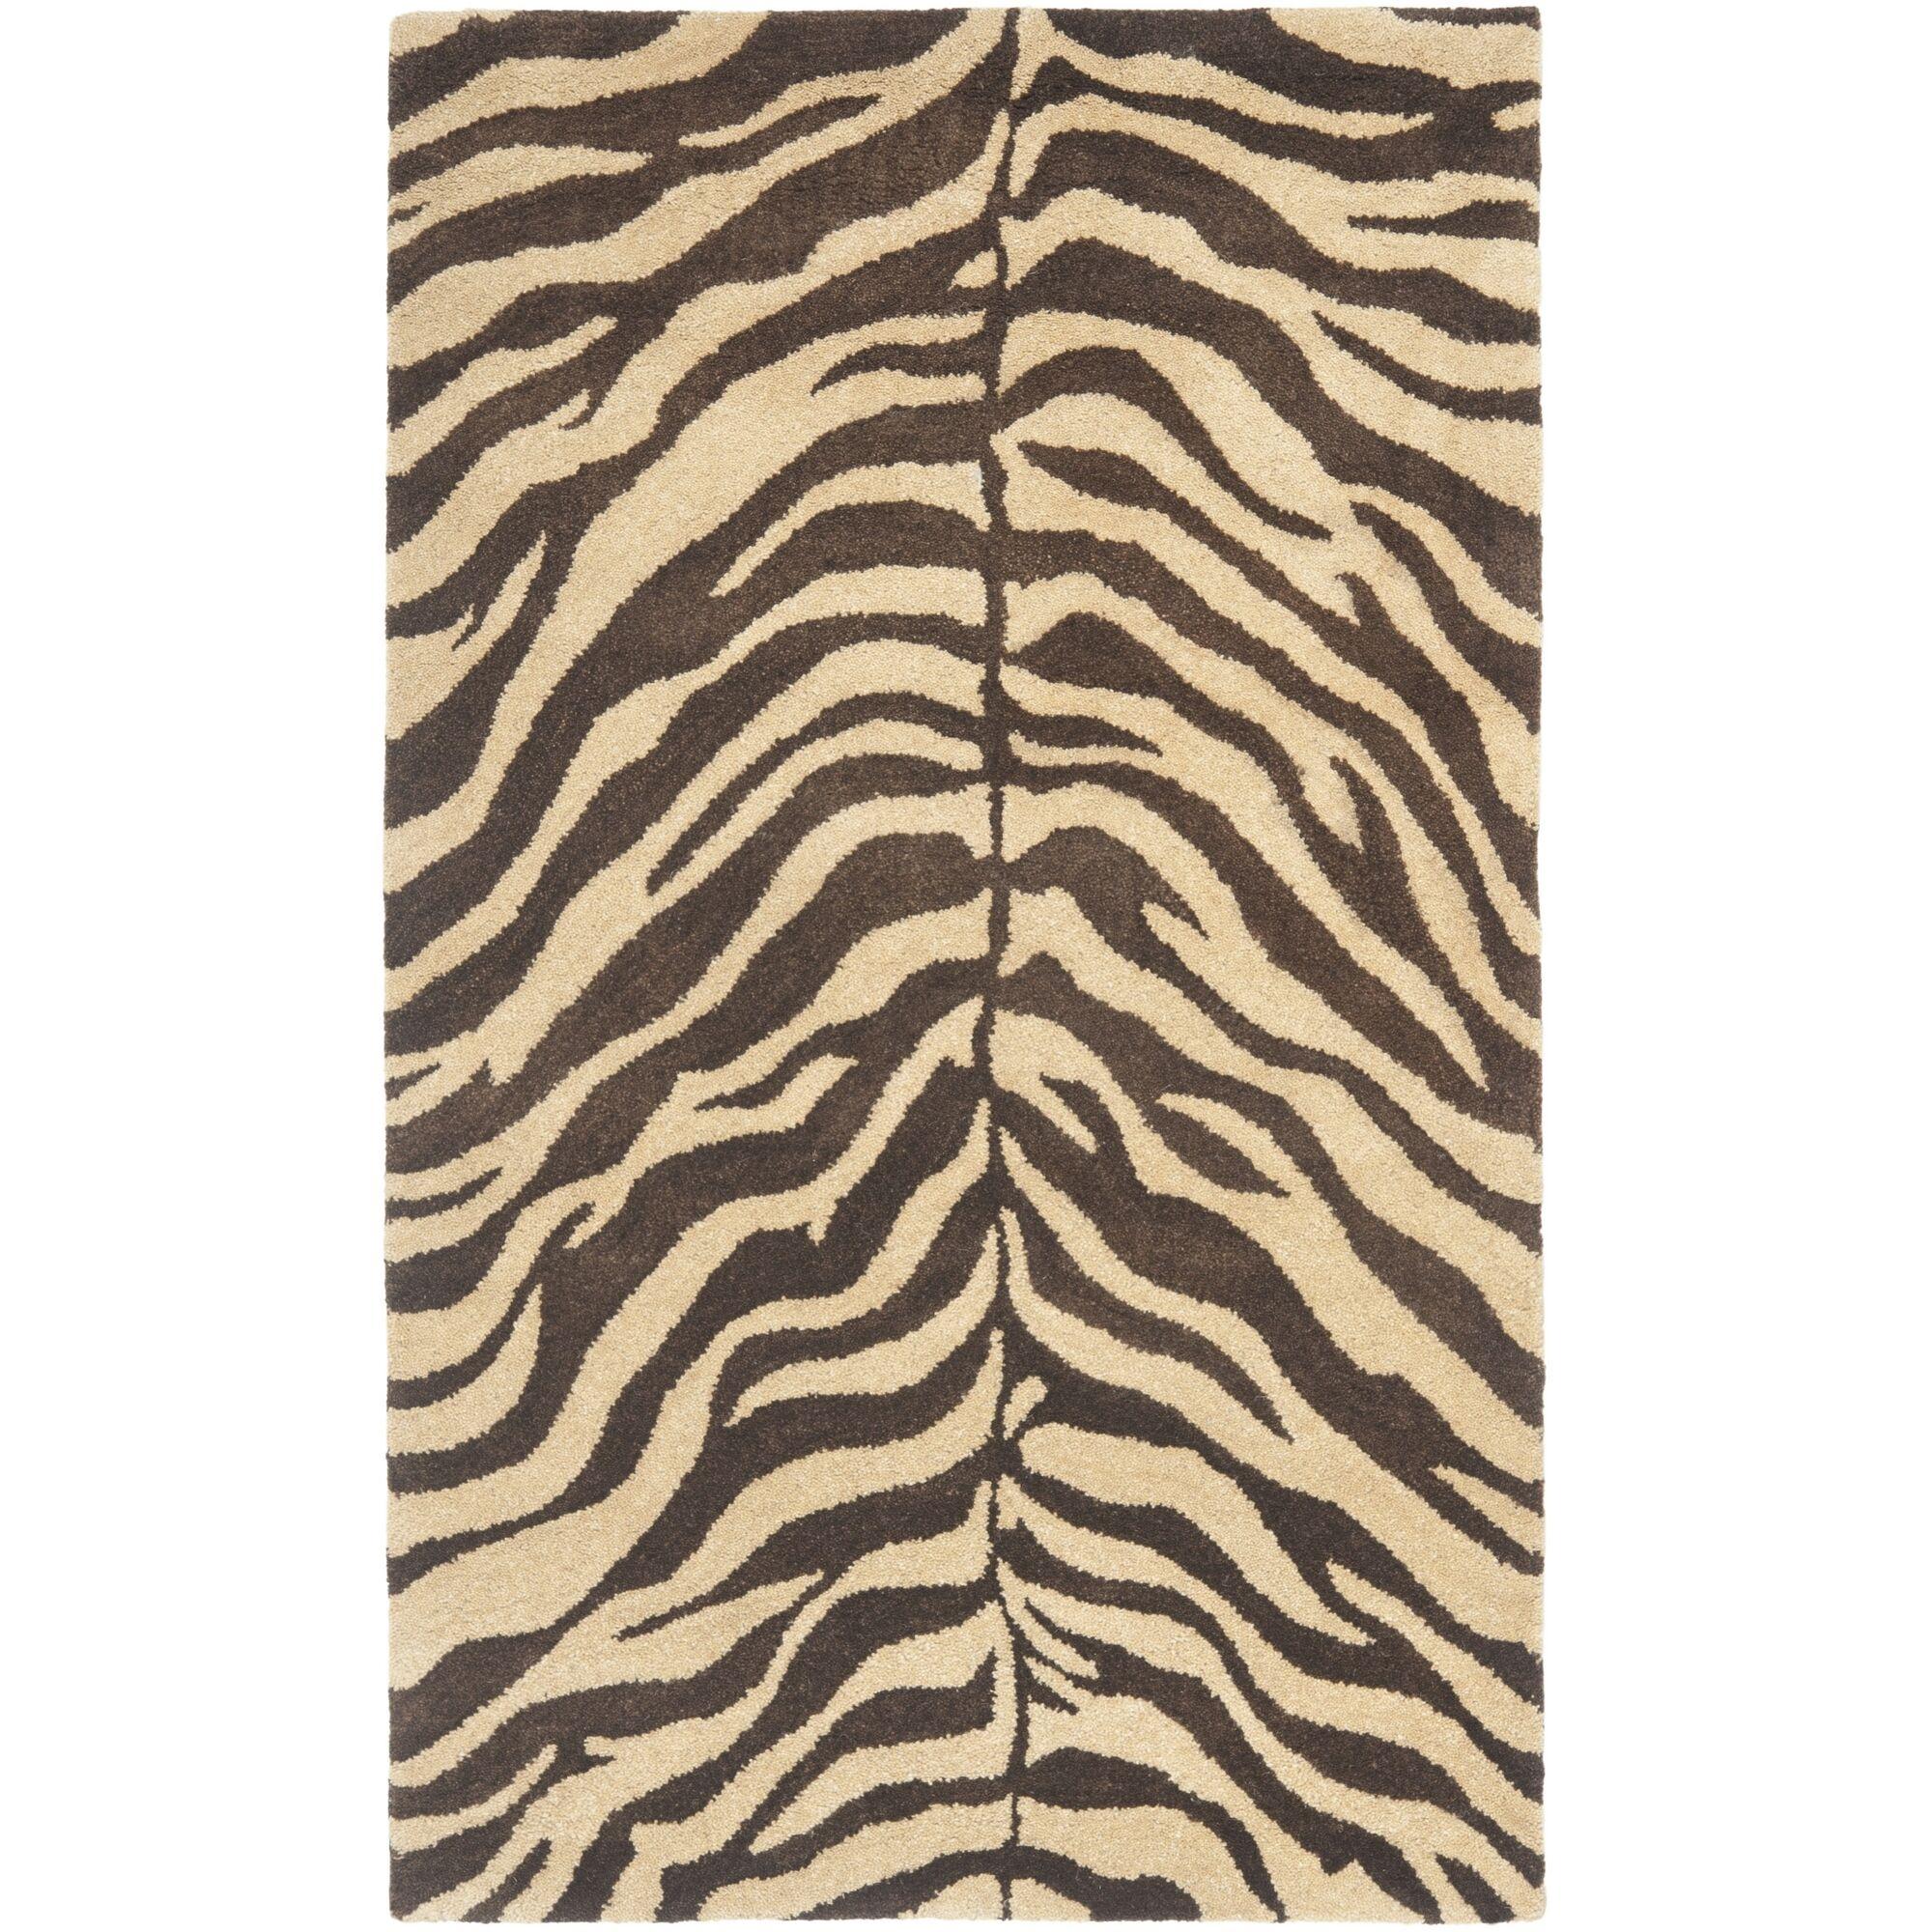 Bergama Beige/Brown Area Rug Rug Size: Rectangle 4' x 6'